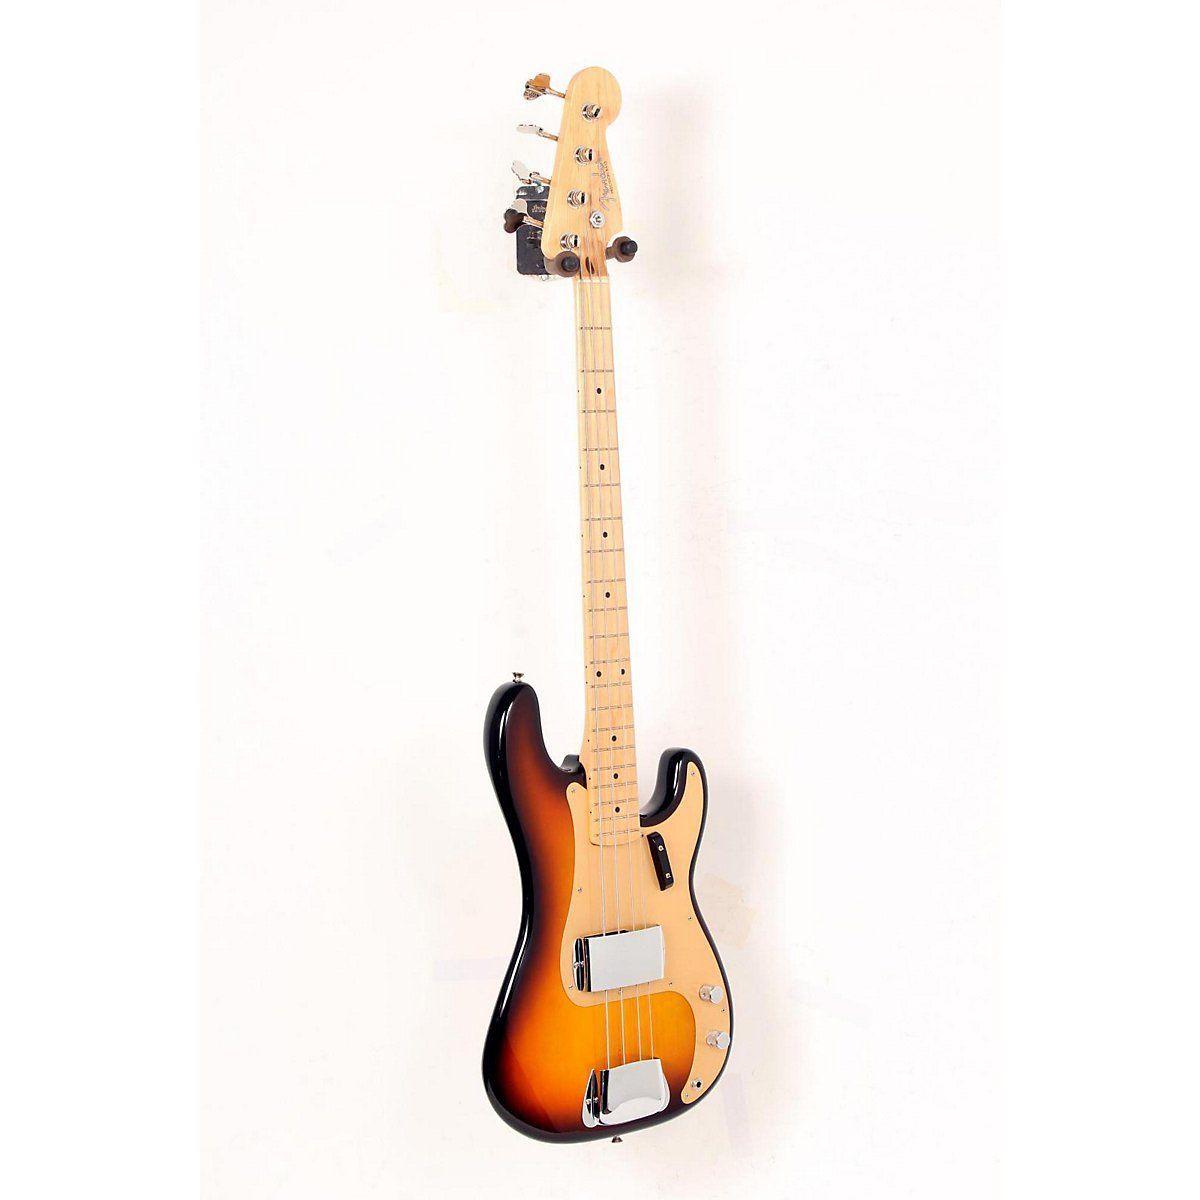 Fender American Vintage 58 Precision Bass Fender American Vintage Fender American American Vintage